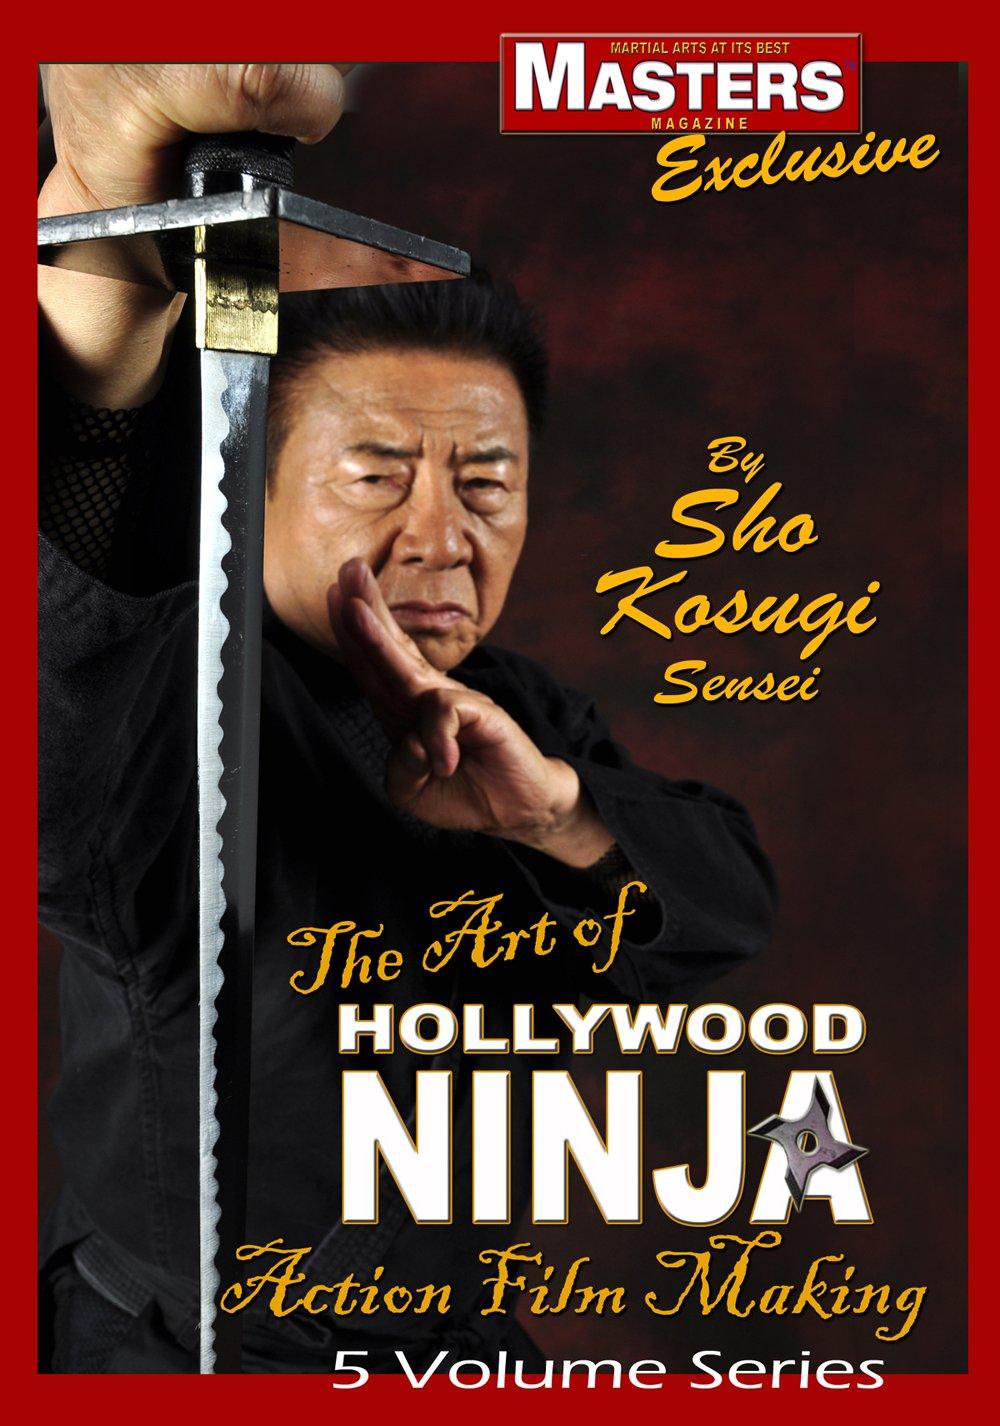 Amazon.com: The Art of Hollywood Ninja Action Film Making (5 ...